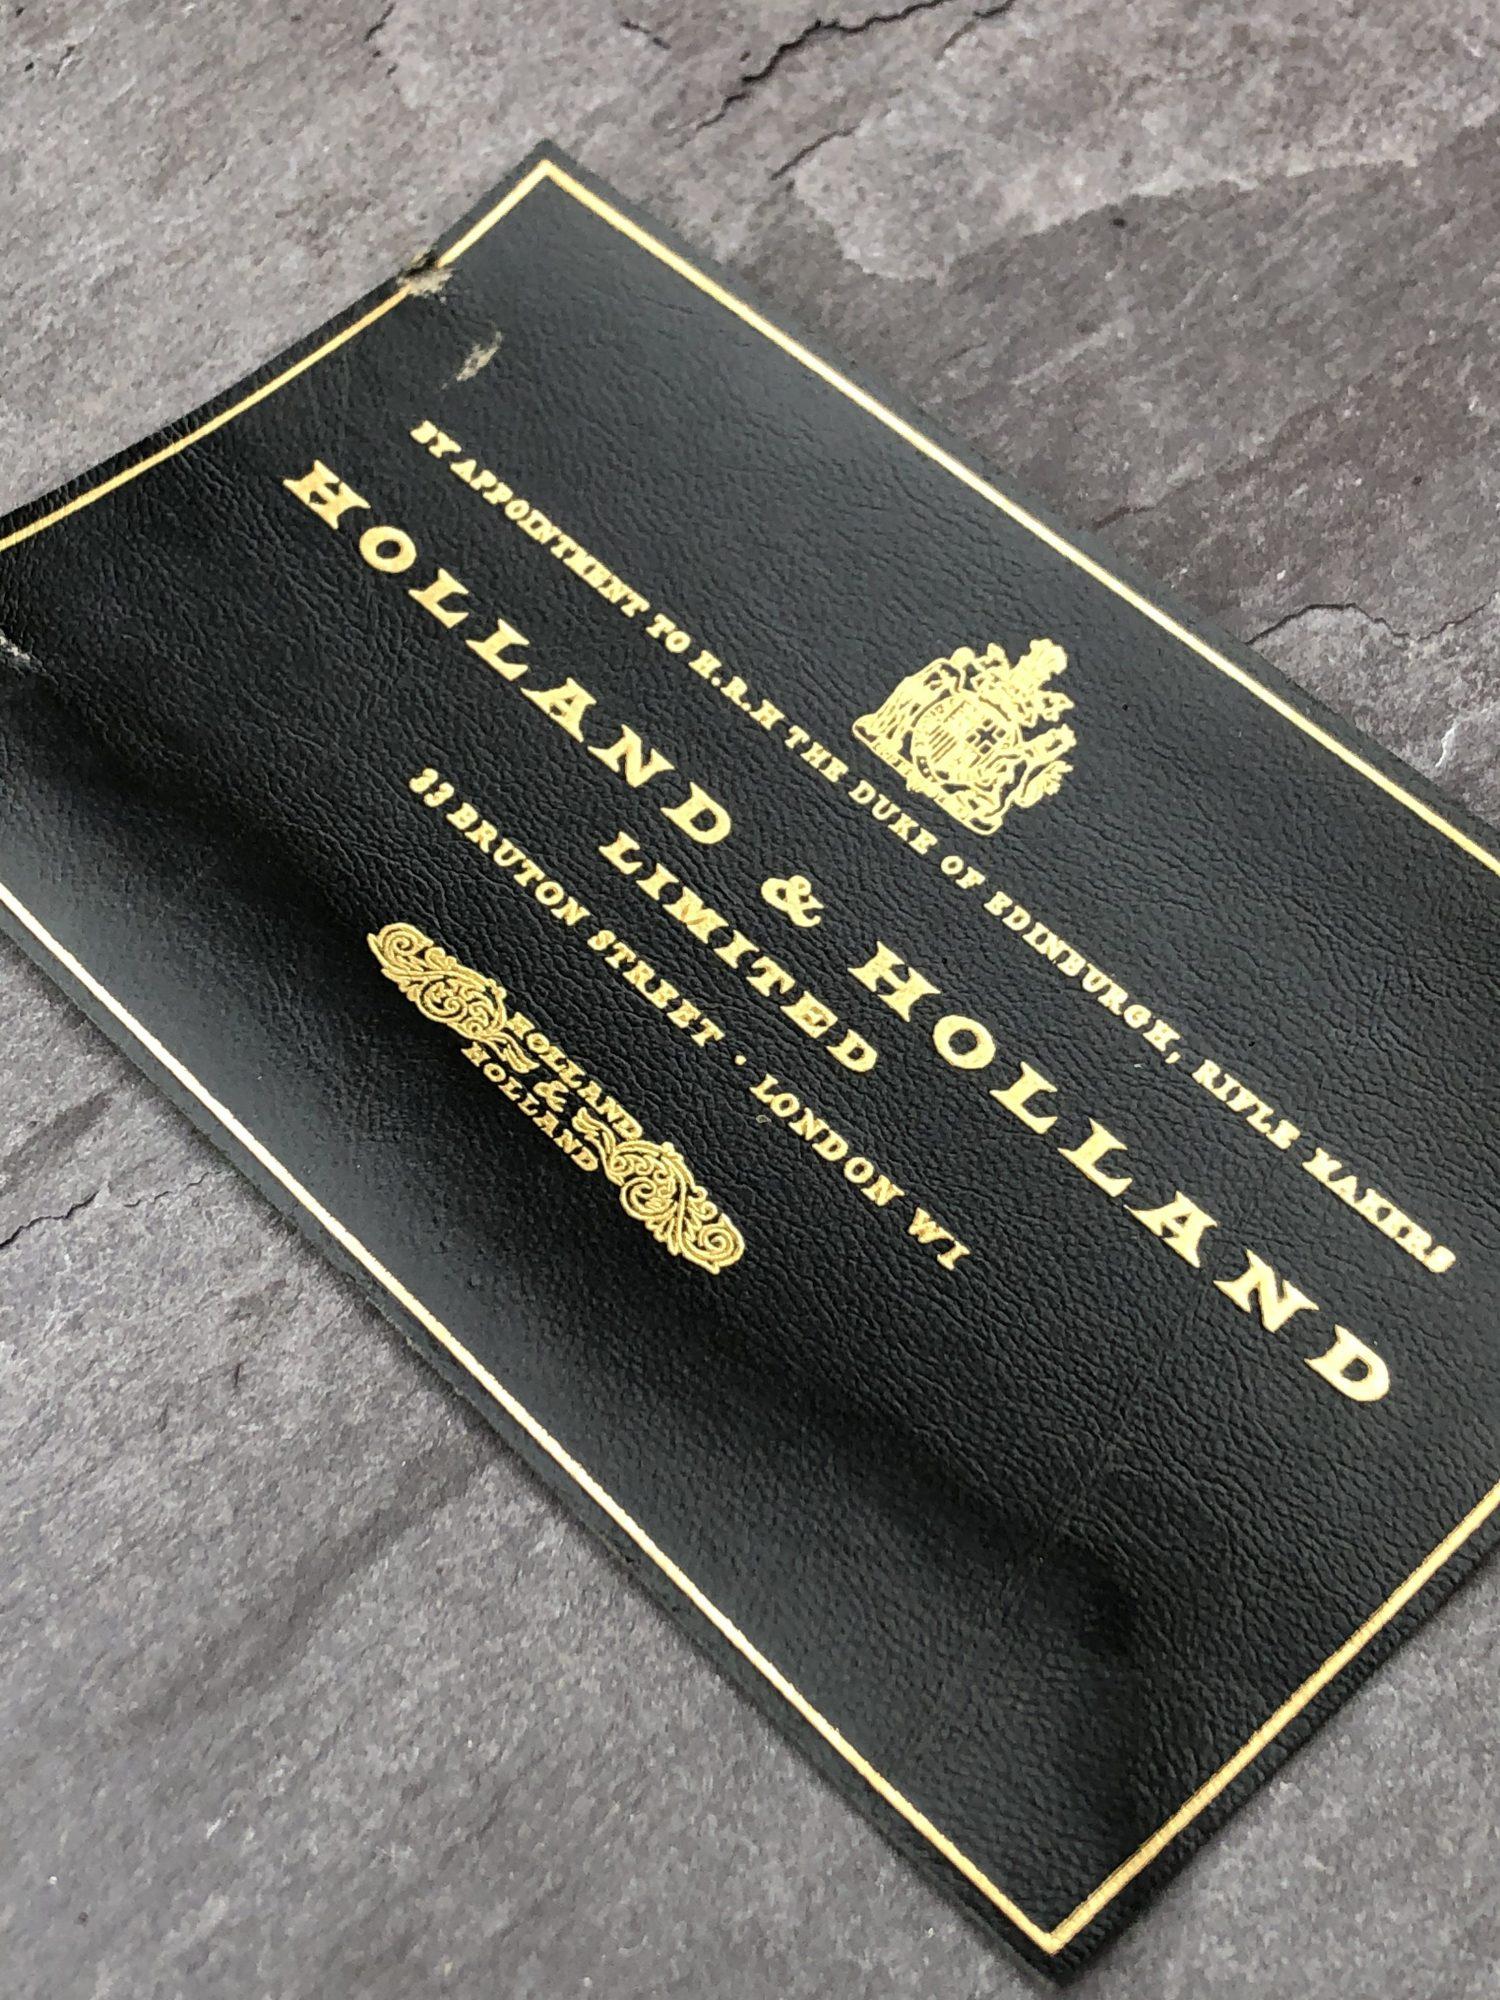 Holland & Holland Case Label